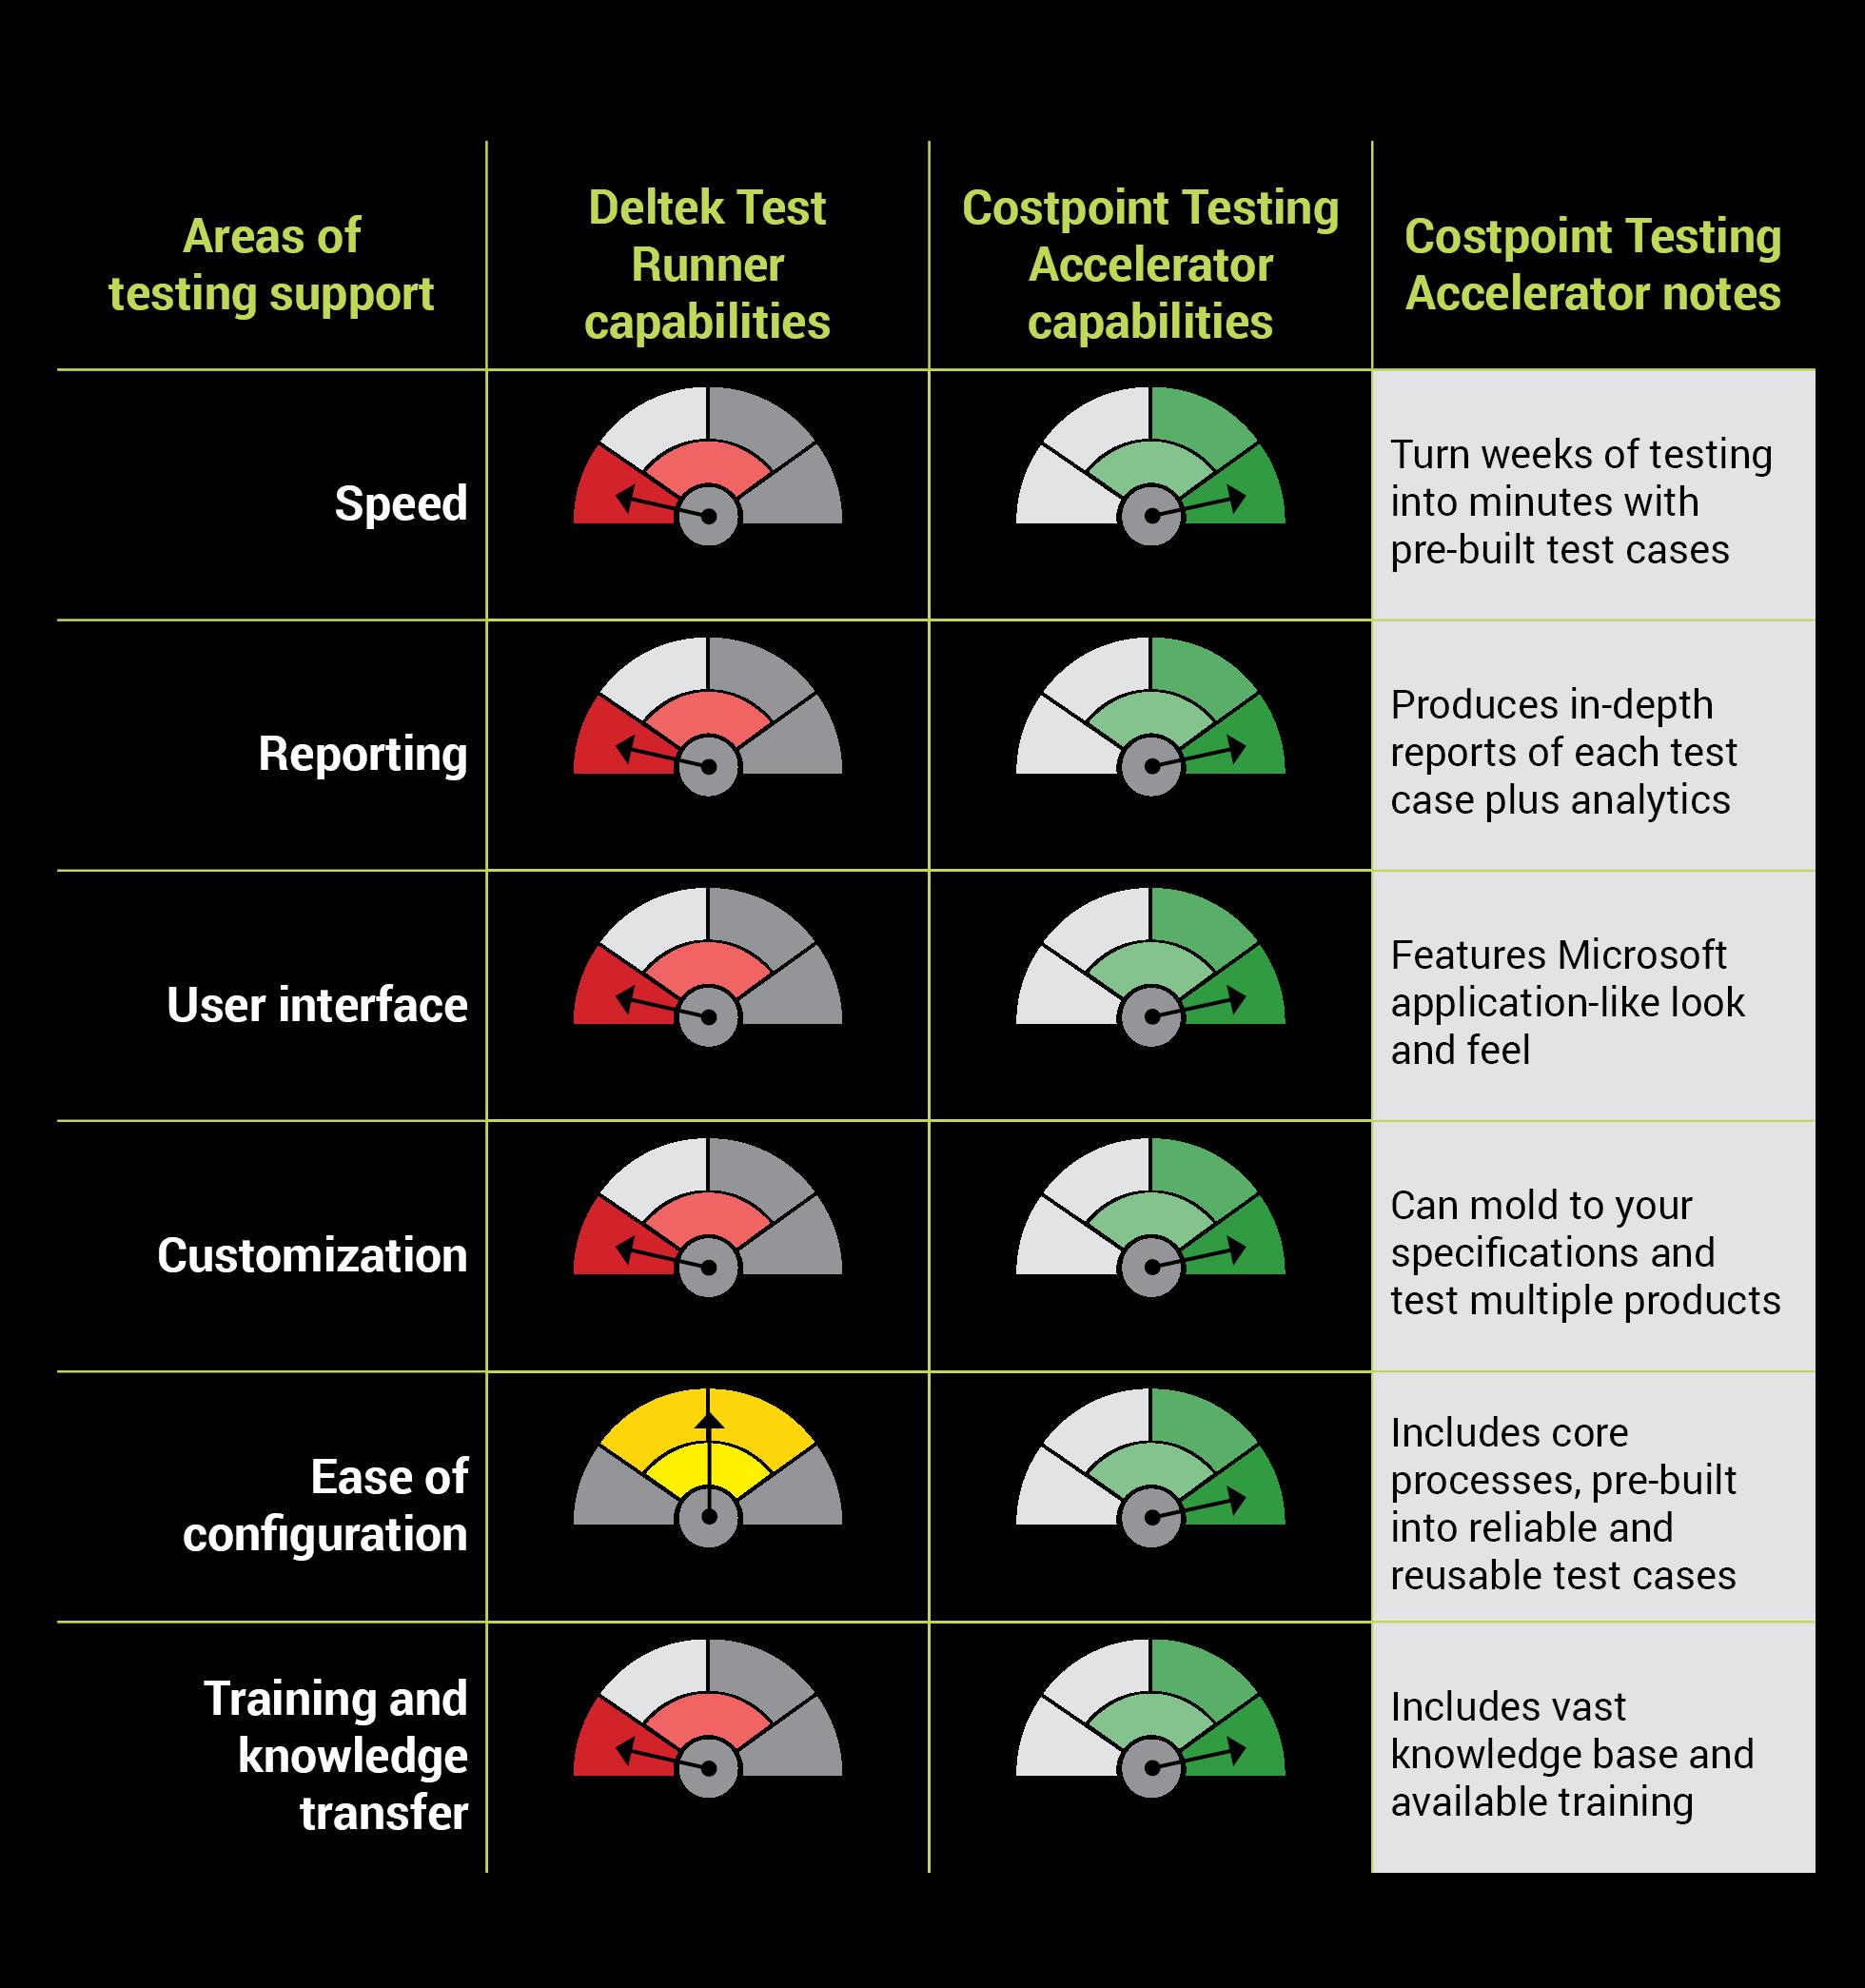 Costpoint Testing Accelerator